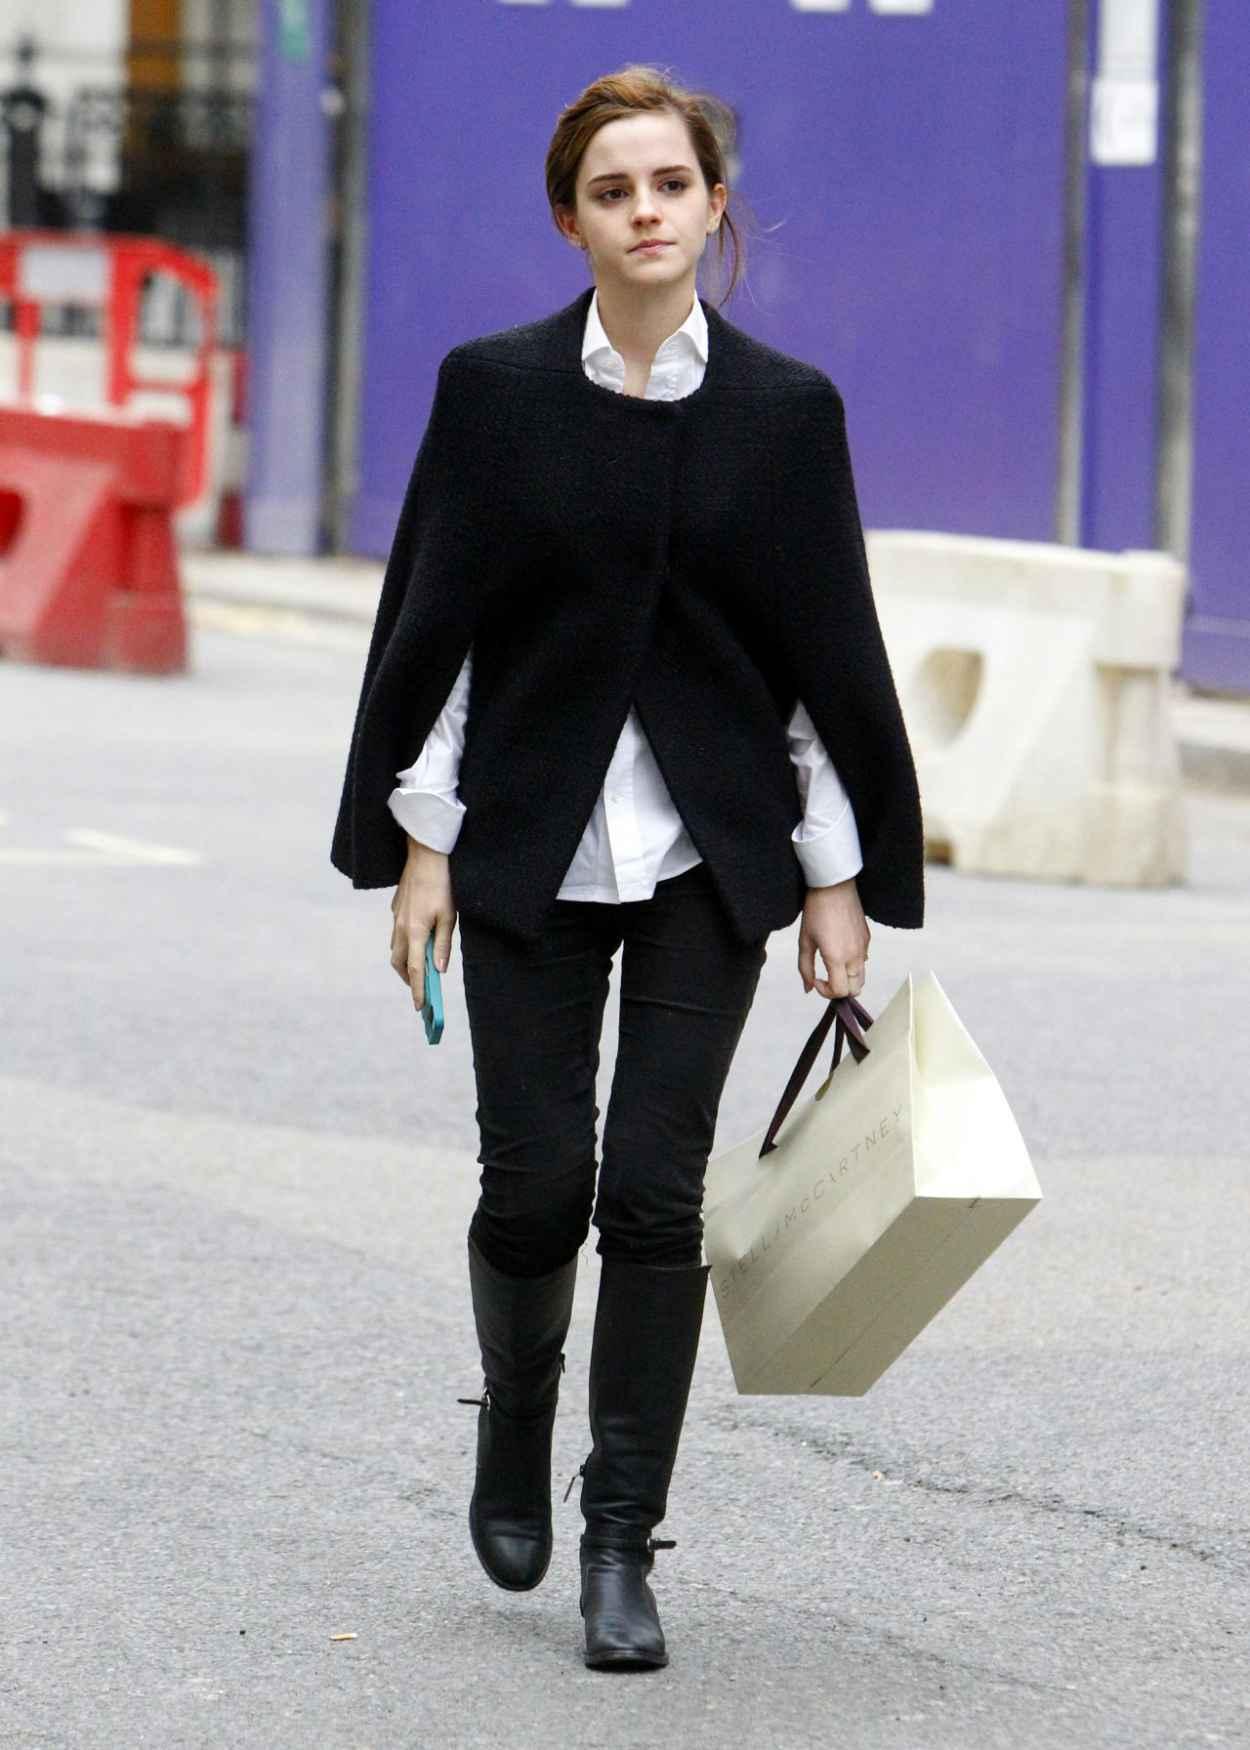 Emma Watson Street Style - Shopping Around Bond Street in Central London - December 2015-1